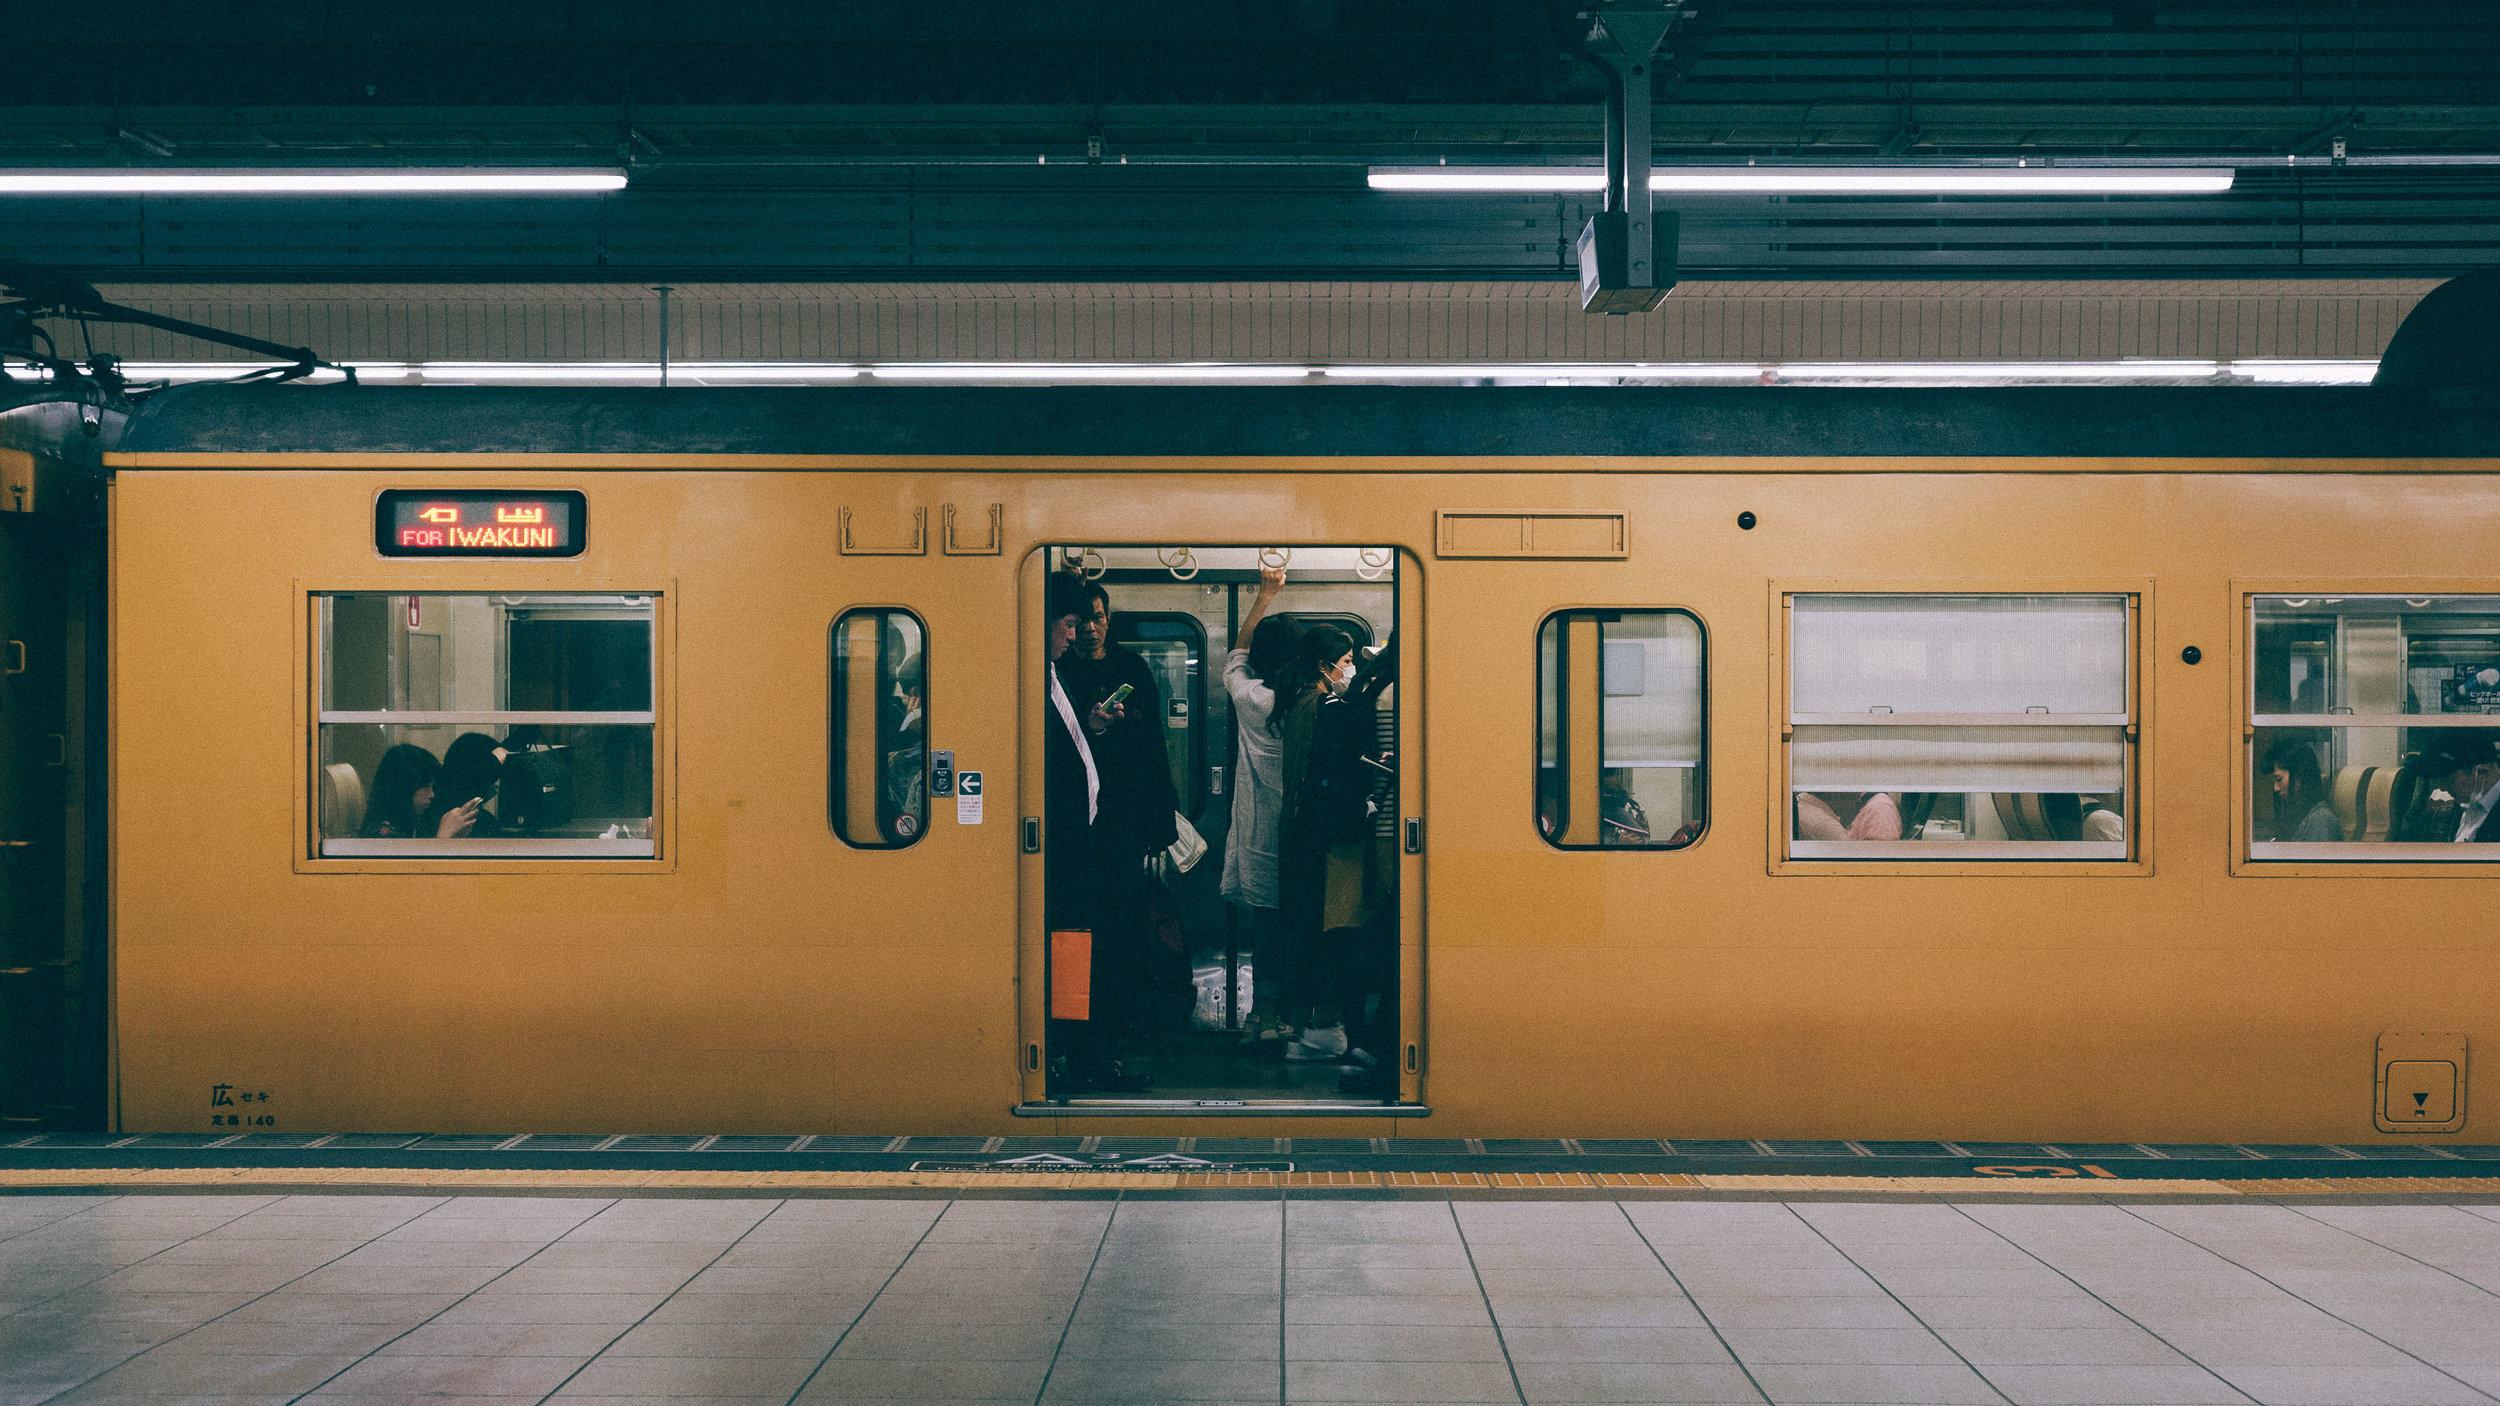 wakuni-train-platform-street-photography.jpg